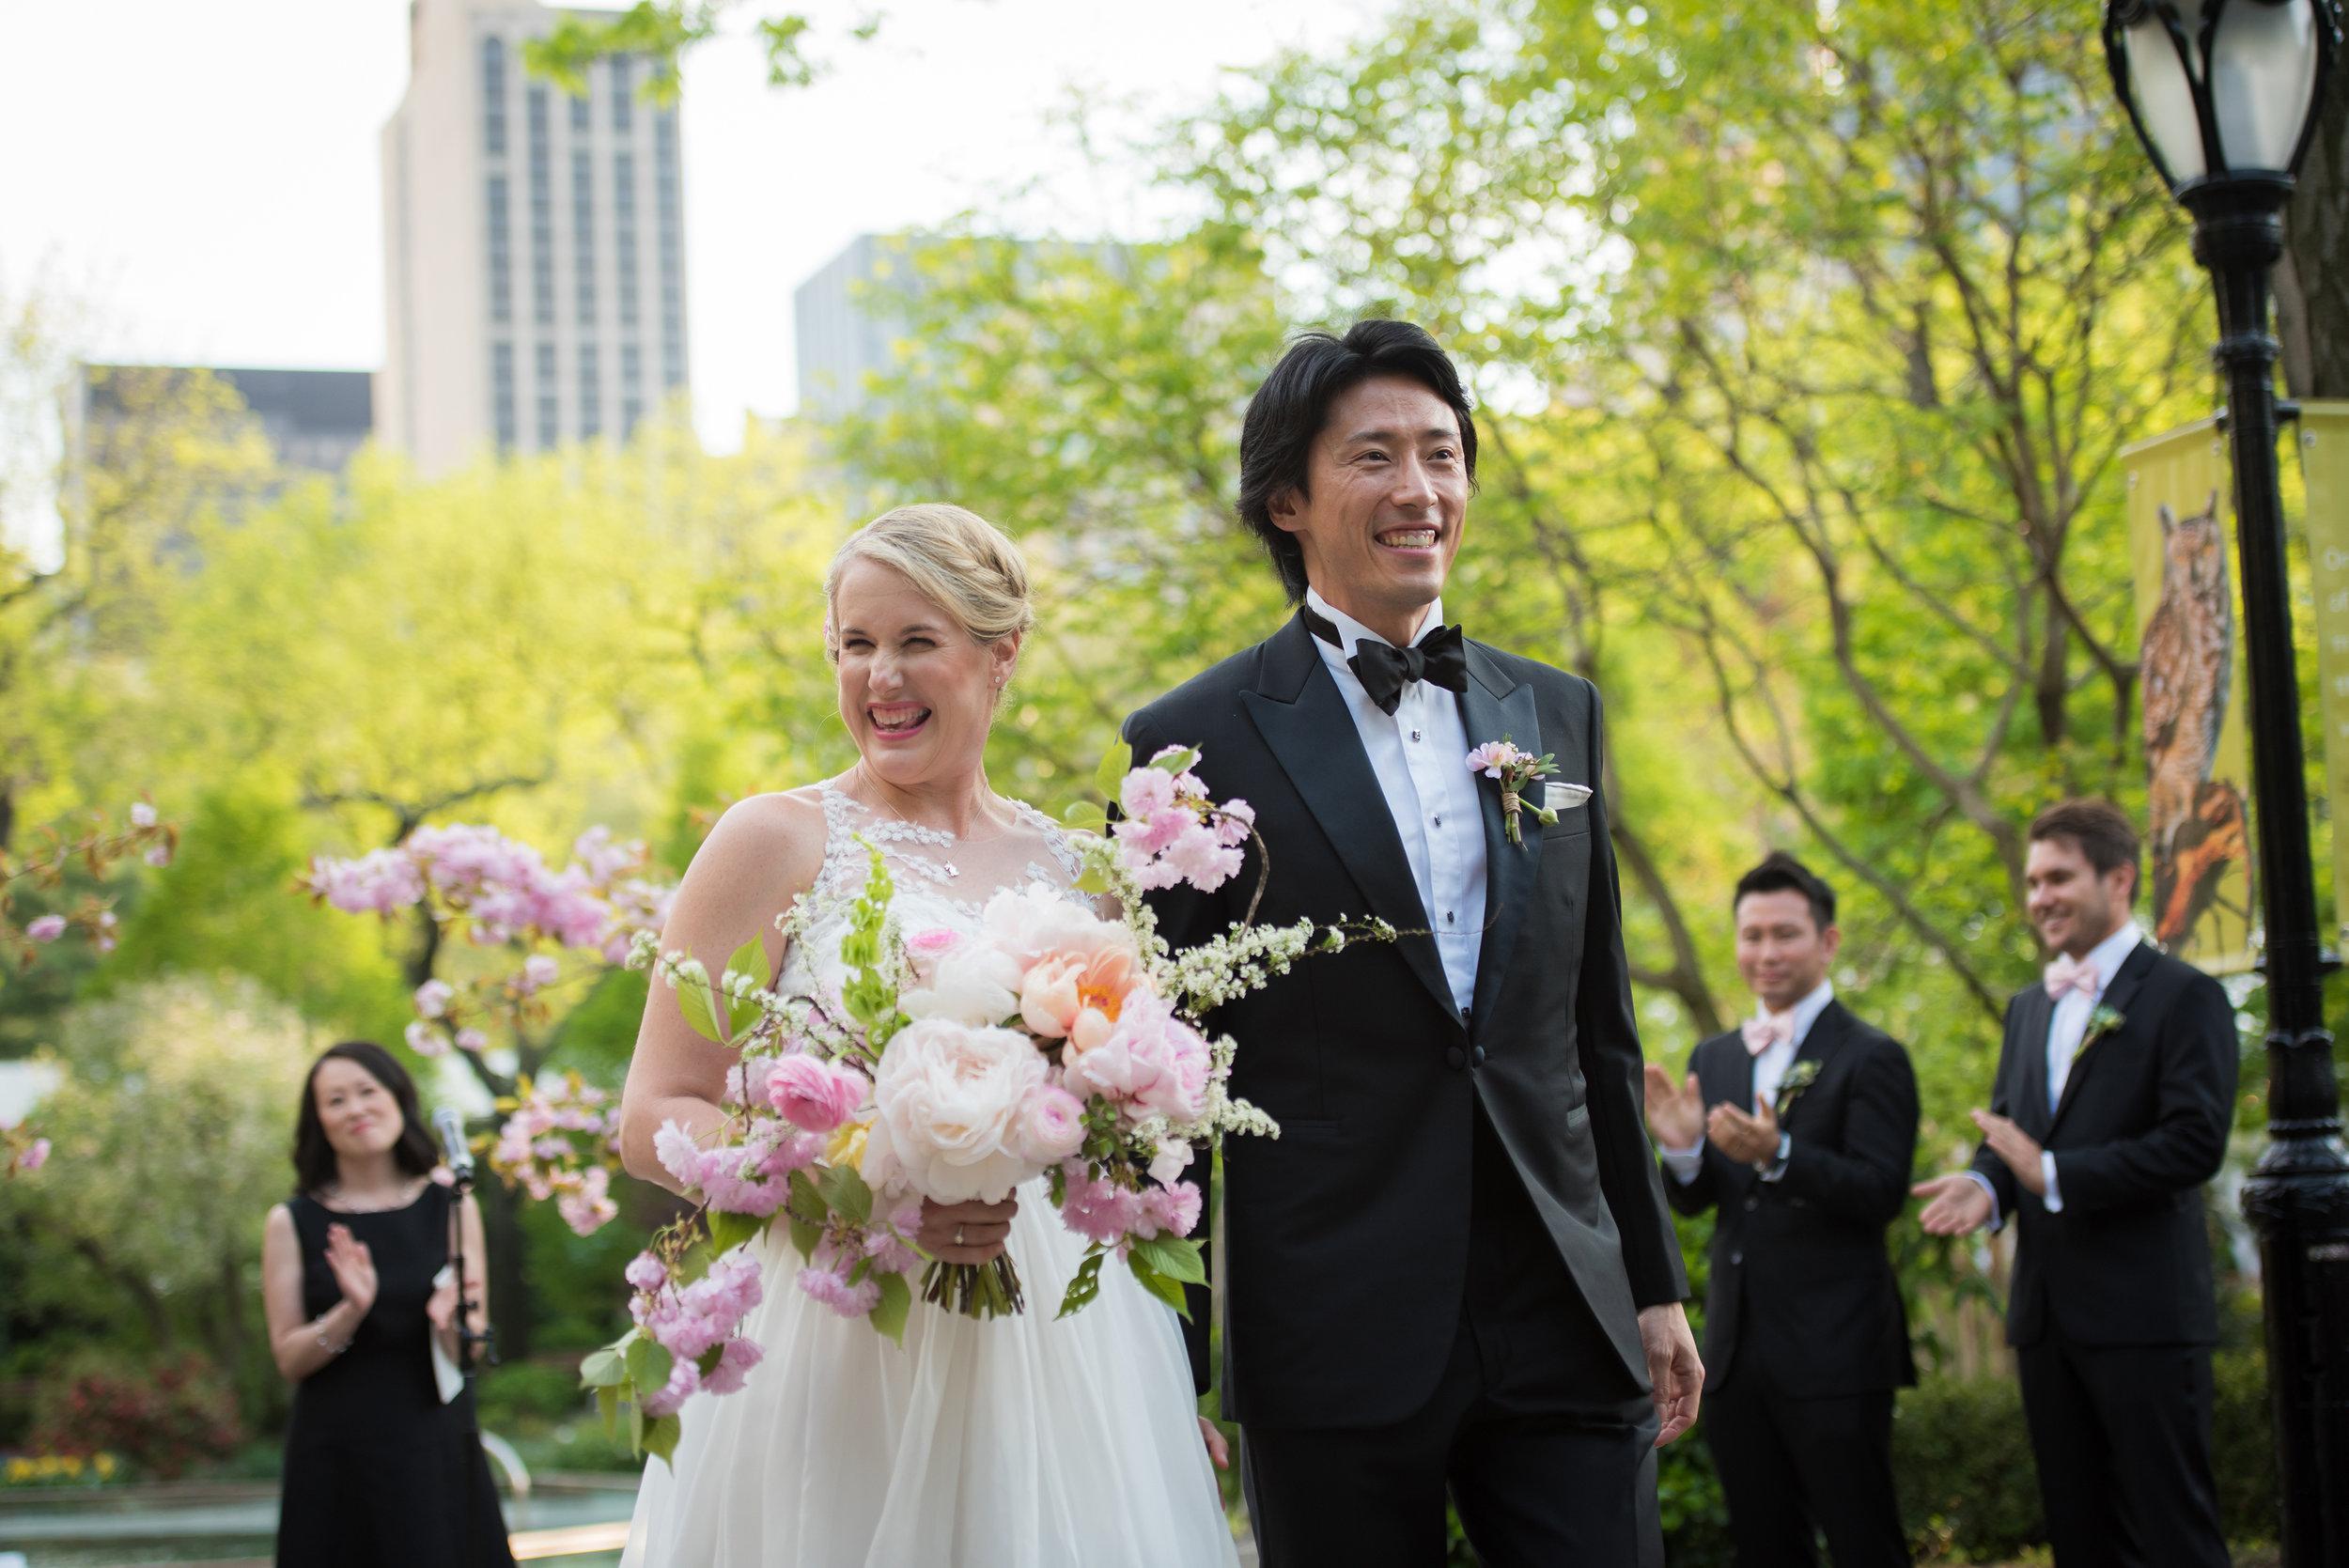 victorious-events-nyc-024-colleen-taka-central-park-zoo-wedding-raymond-hamlin.jpg